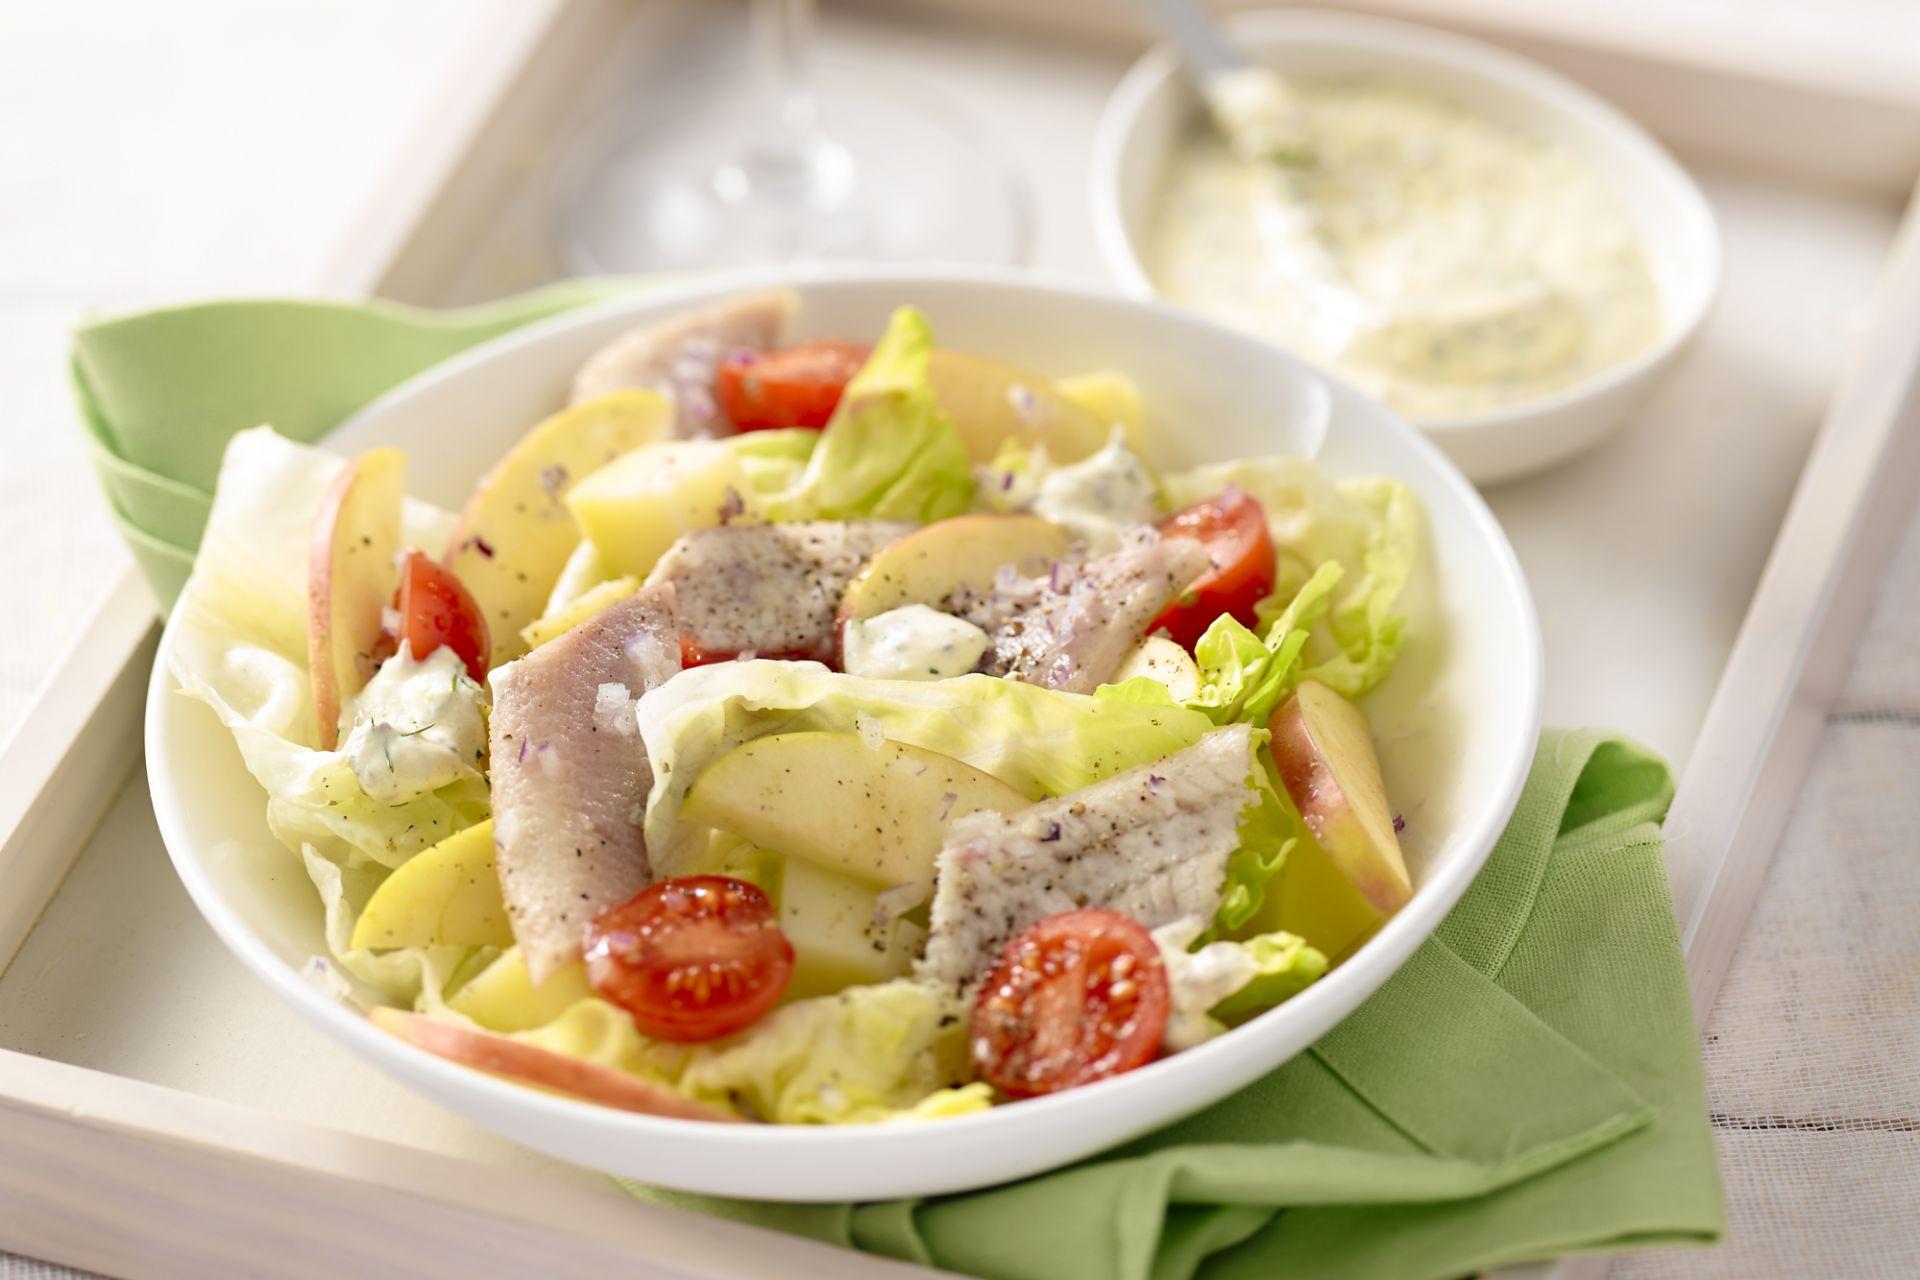 Salade met haring en appel